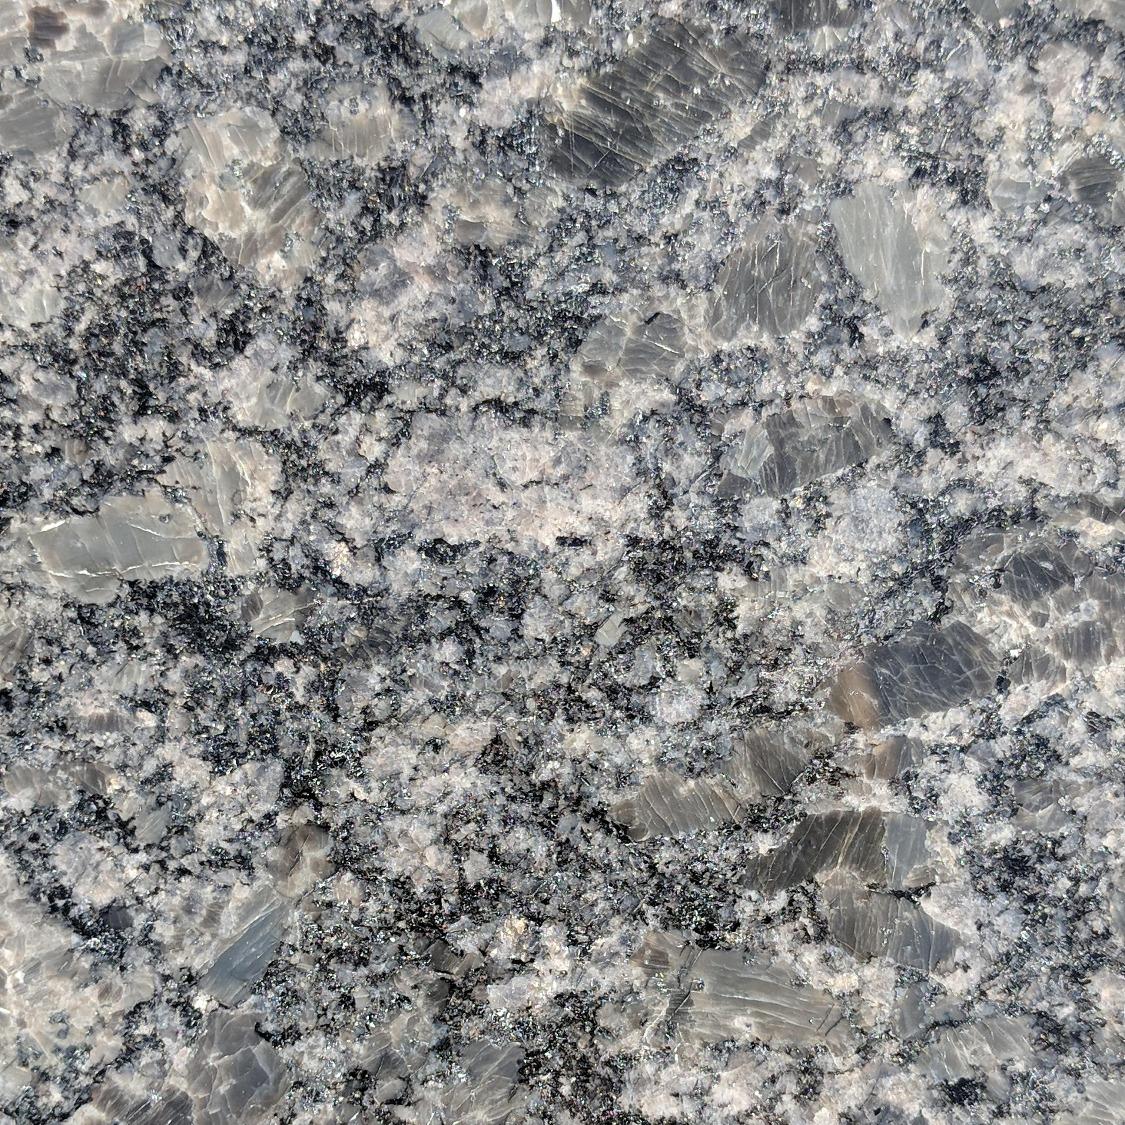 Sample Stone 2